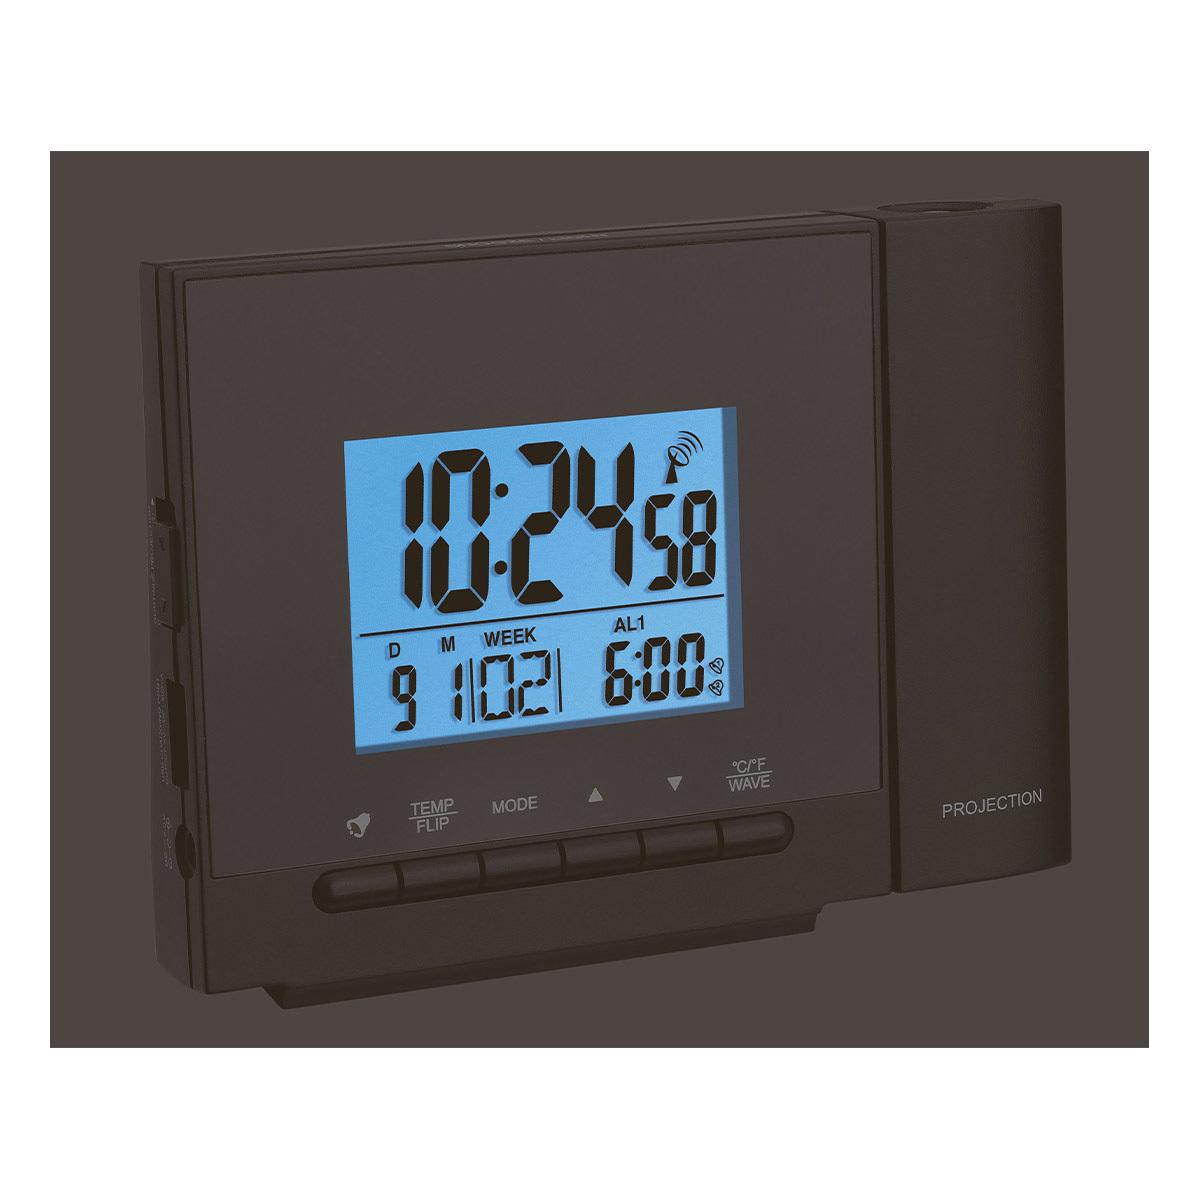 60-5013-01-funk-projektionswecker-mit-temperatur-beleuchtung-1200x1200px.jpg